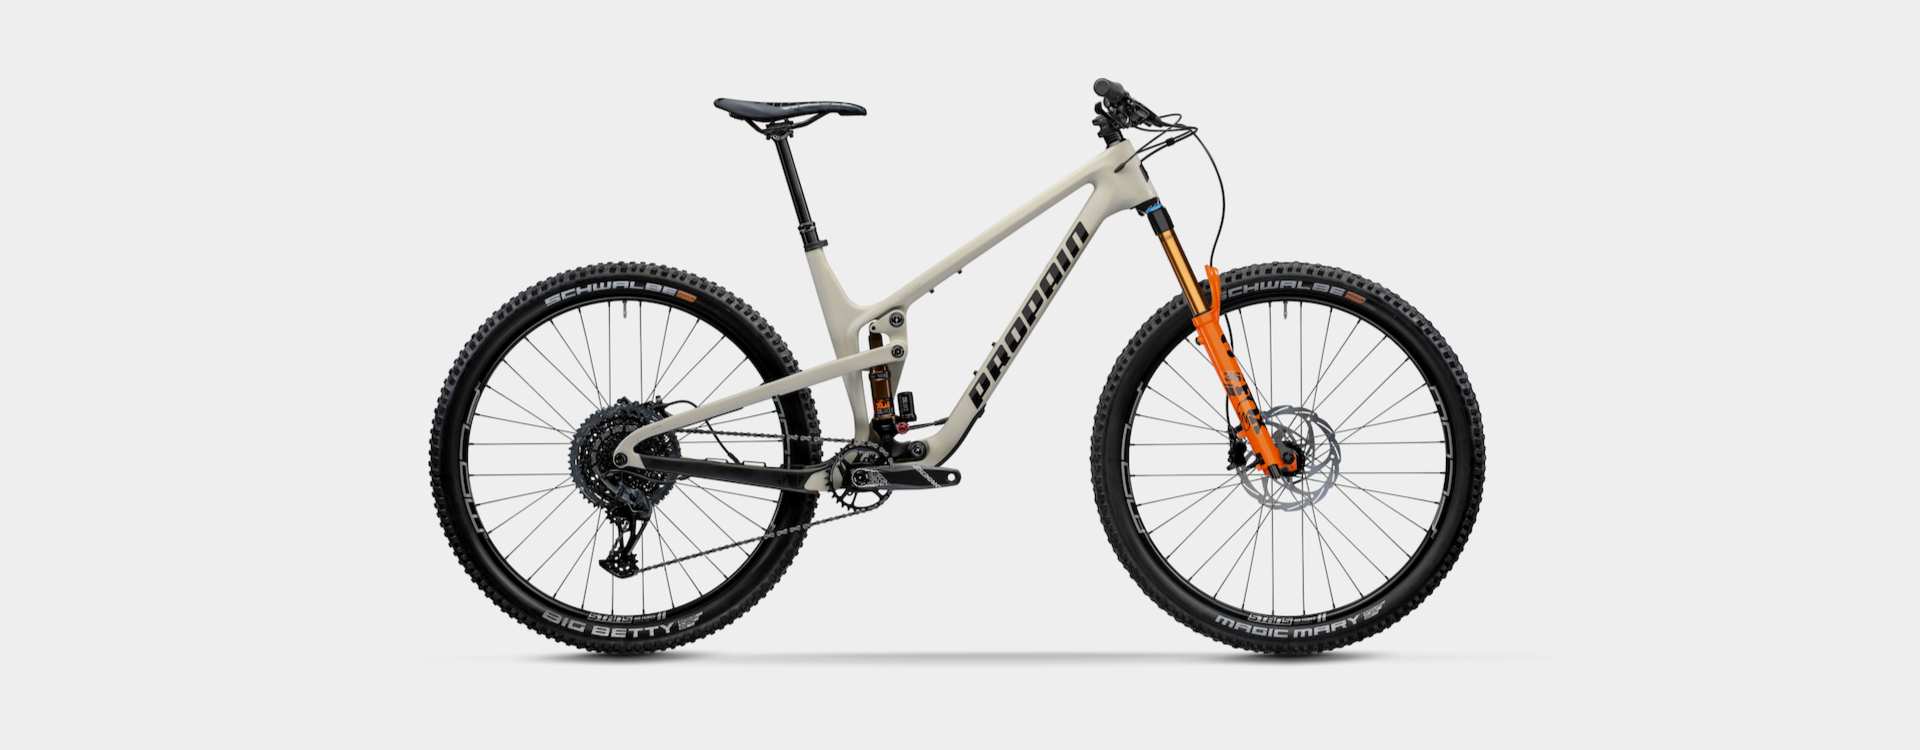 Bike Verleih Gummersbach Propain Bikes Testcenter NRW Hugene 2 - CF - M - Safari - 1920x750px